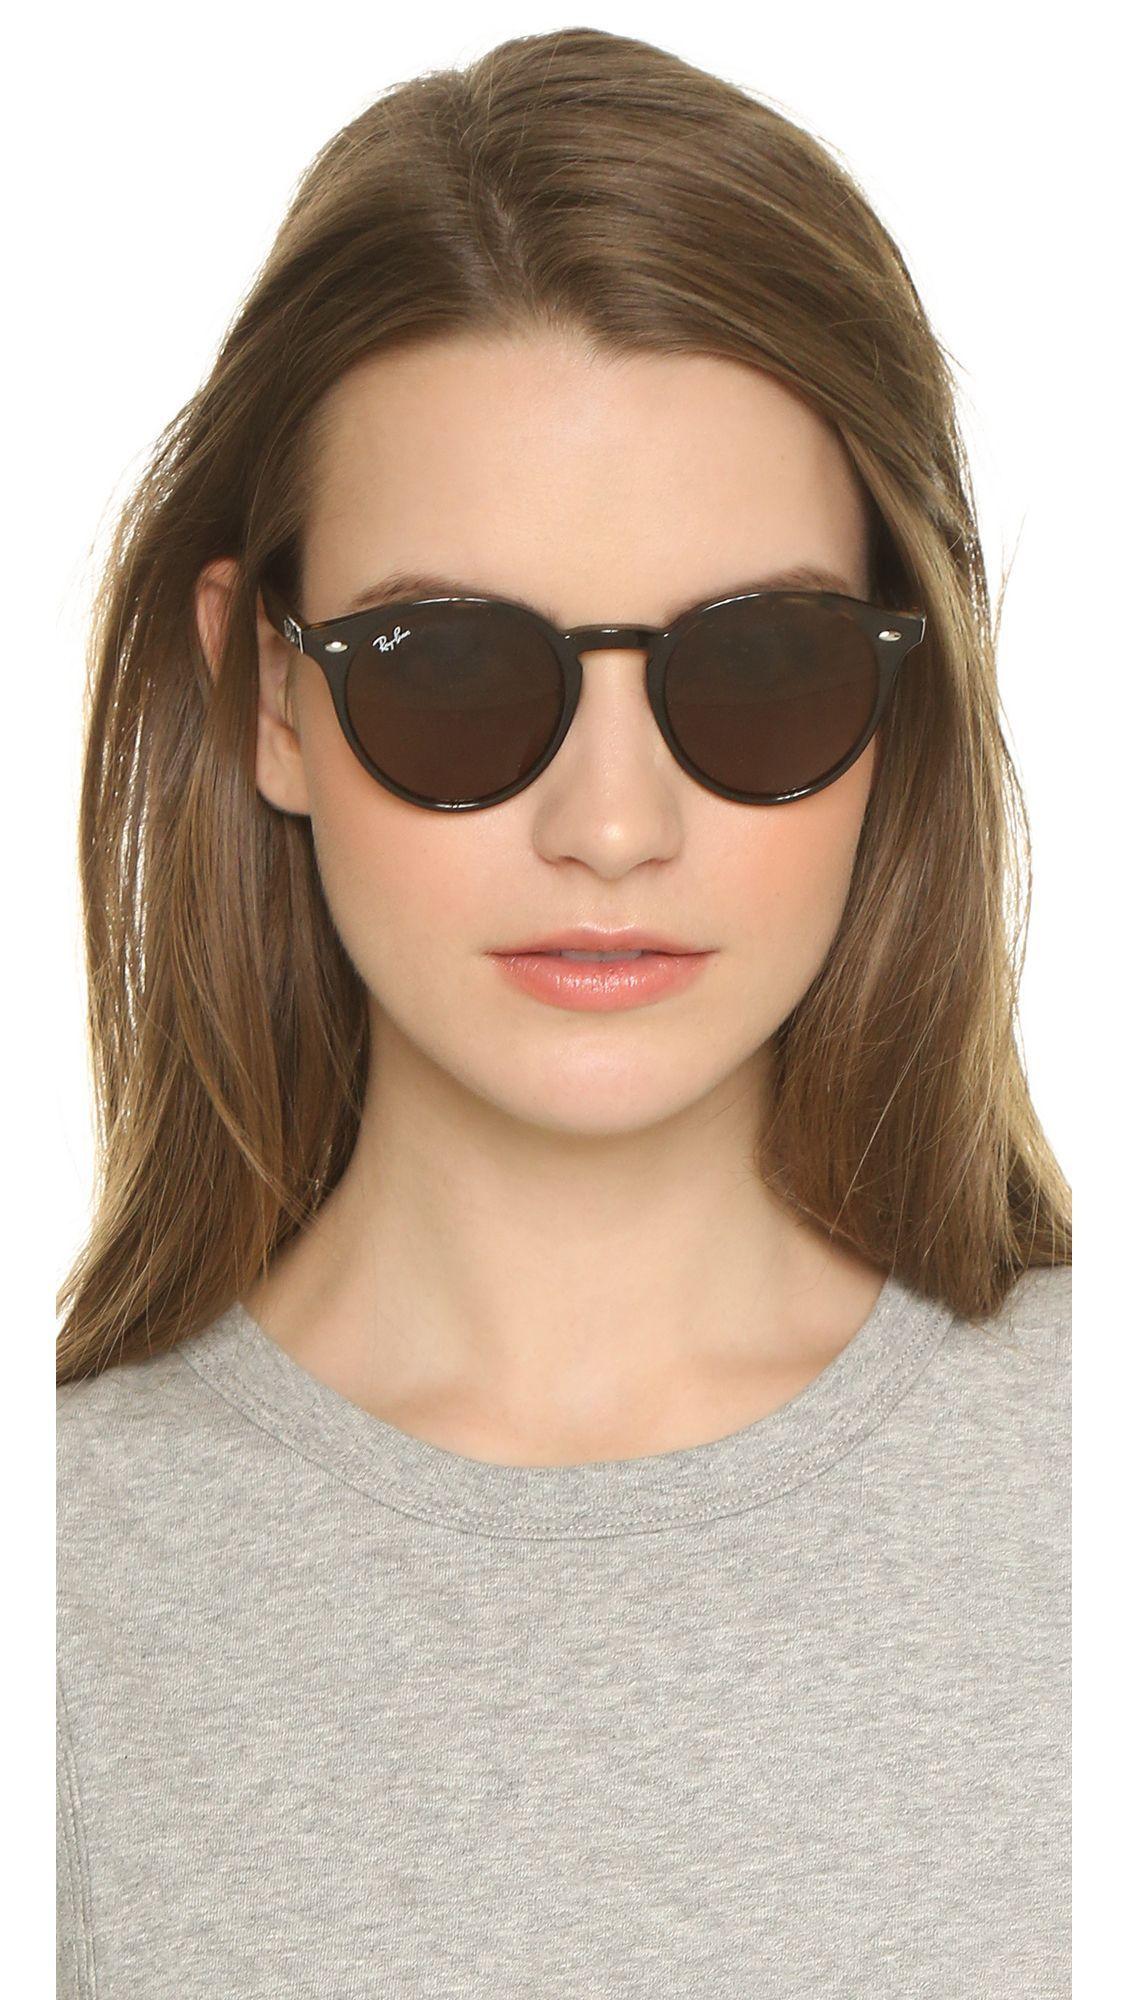 088a21bf46e5 Ray-Ban Highstreet Round Sunglasses | New york fashion | Ray ban ...